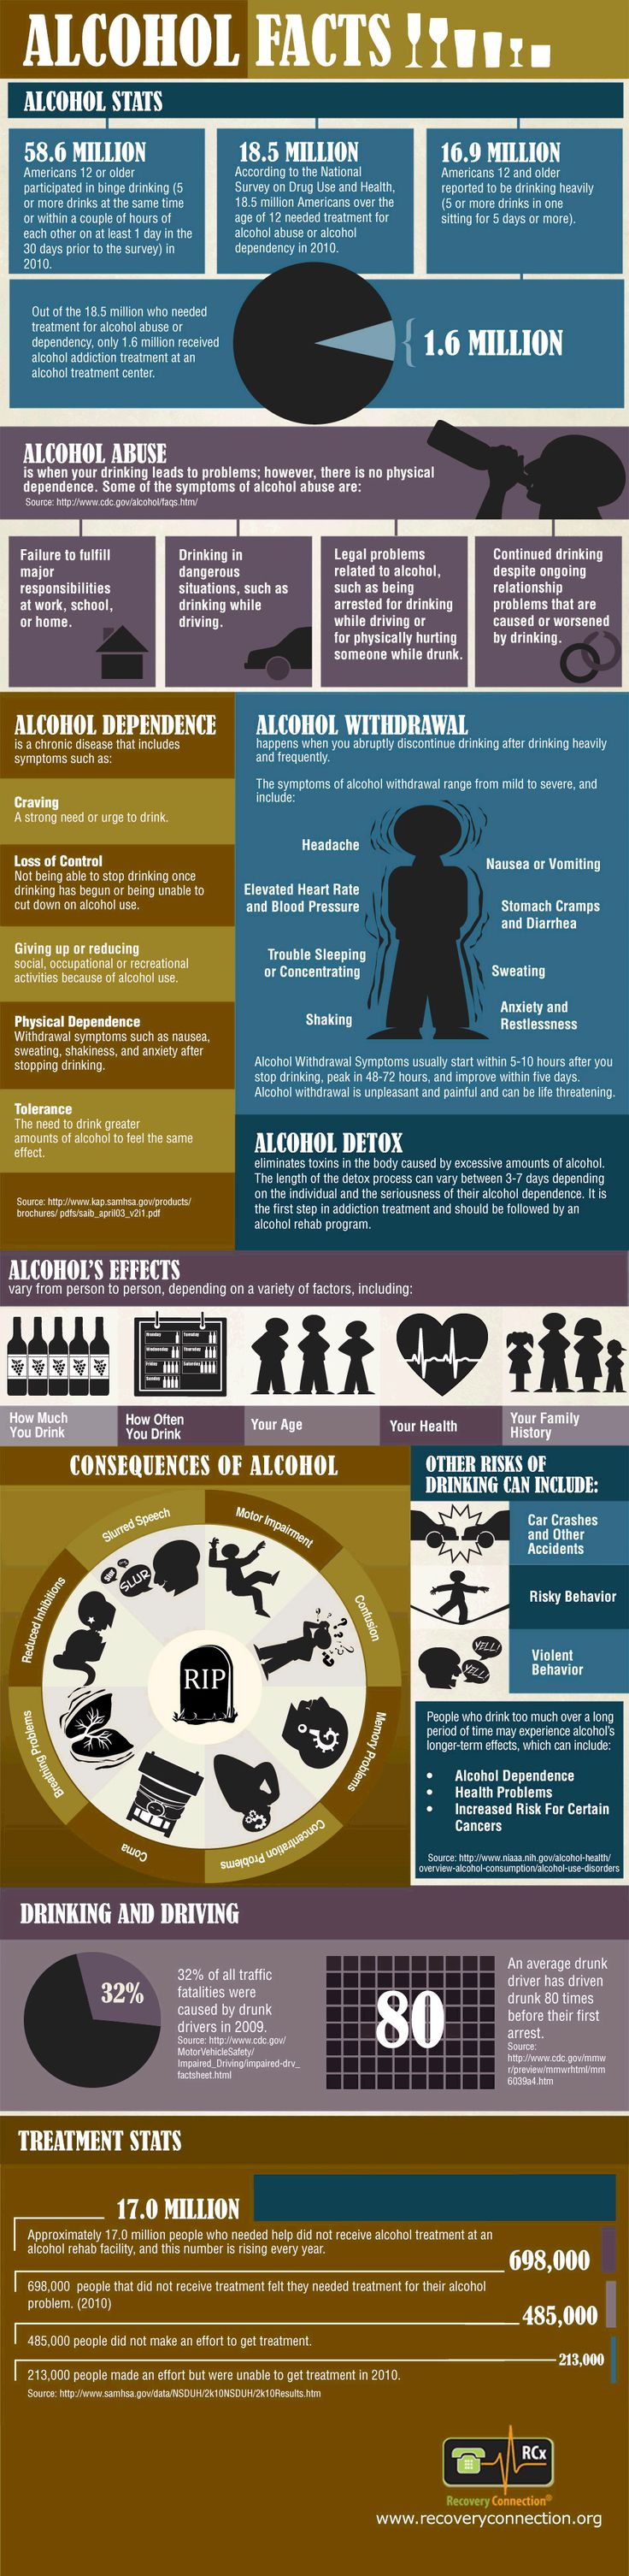 alcohol recovery diarrhea